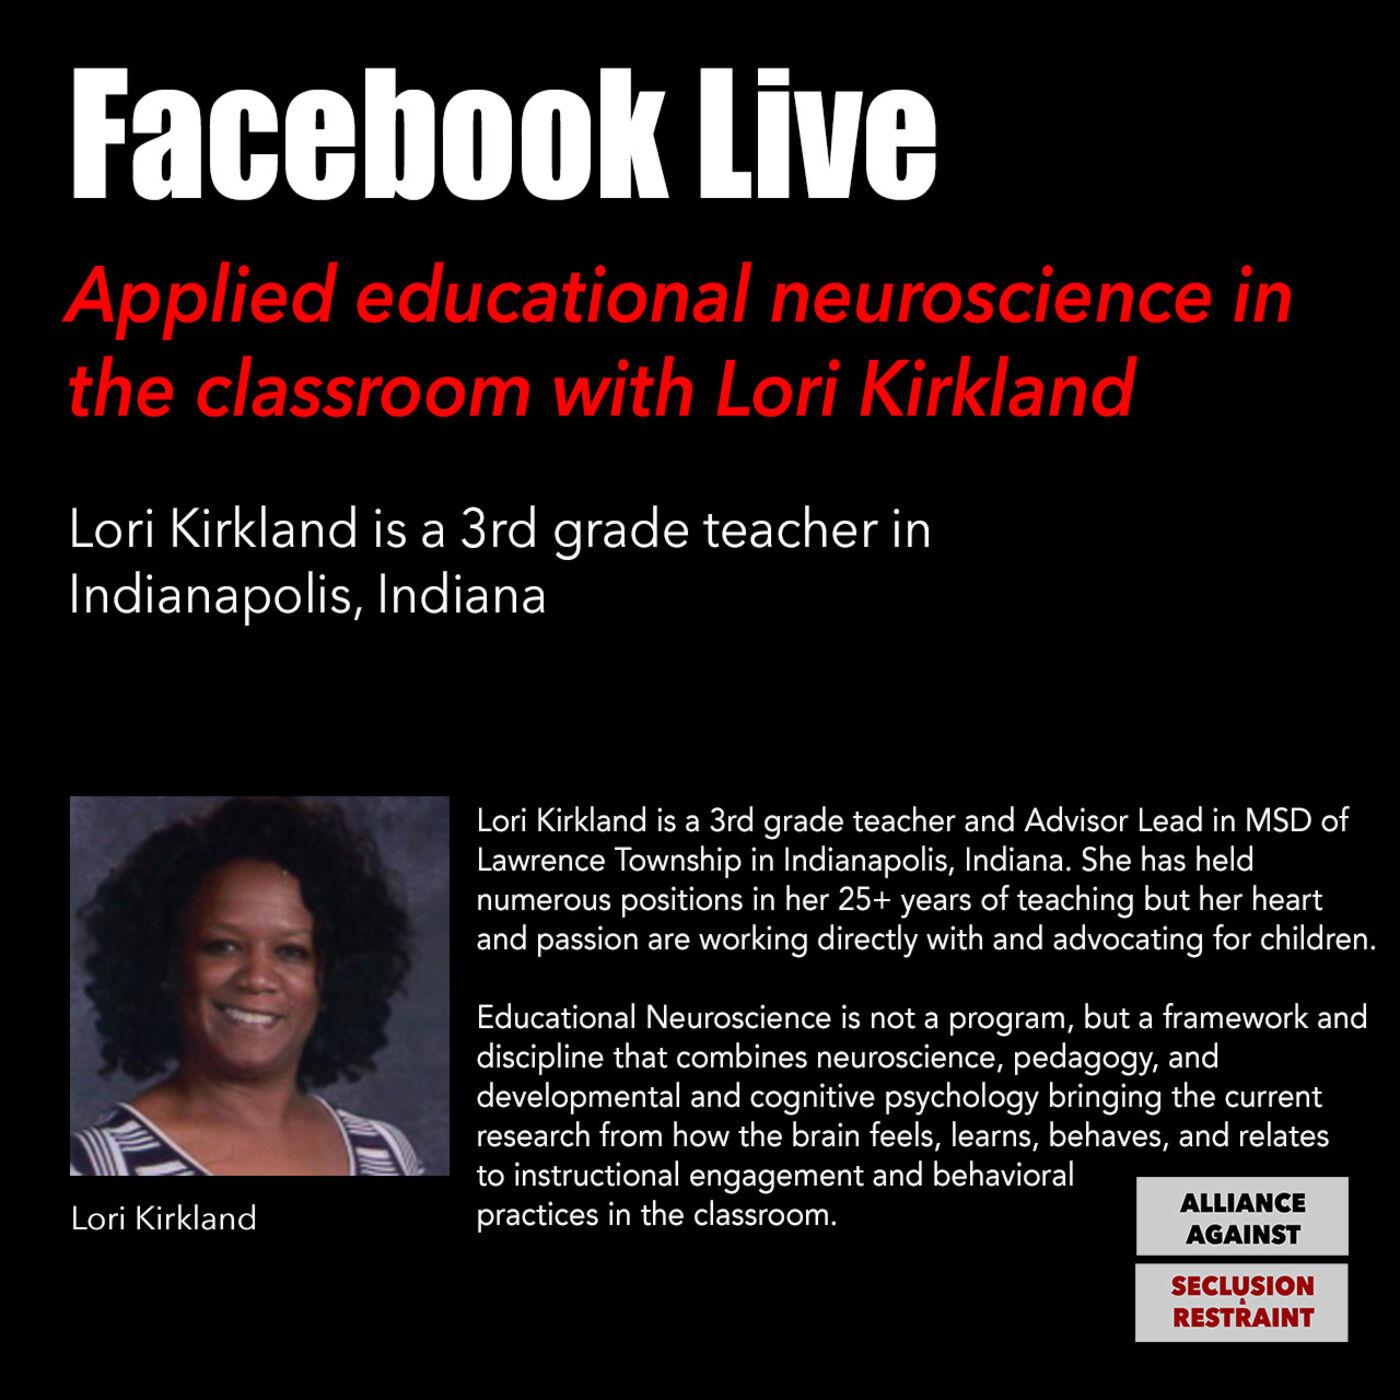 Applied educational neuroscience in the classroom with Lori Kirkland